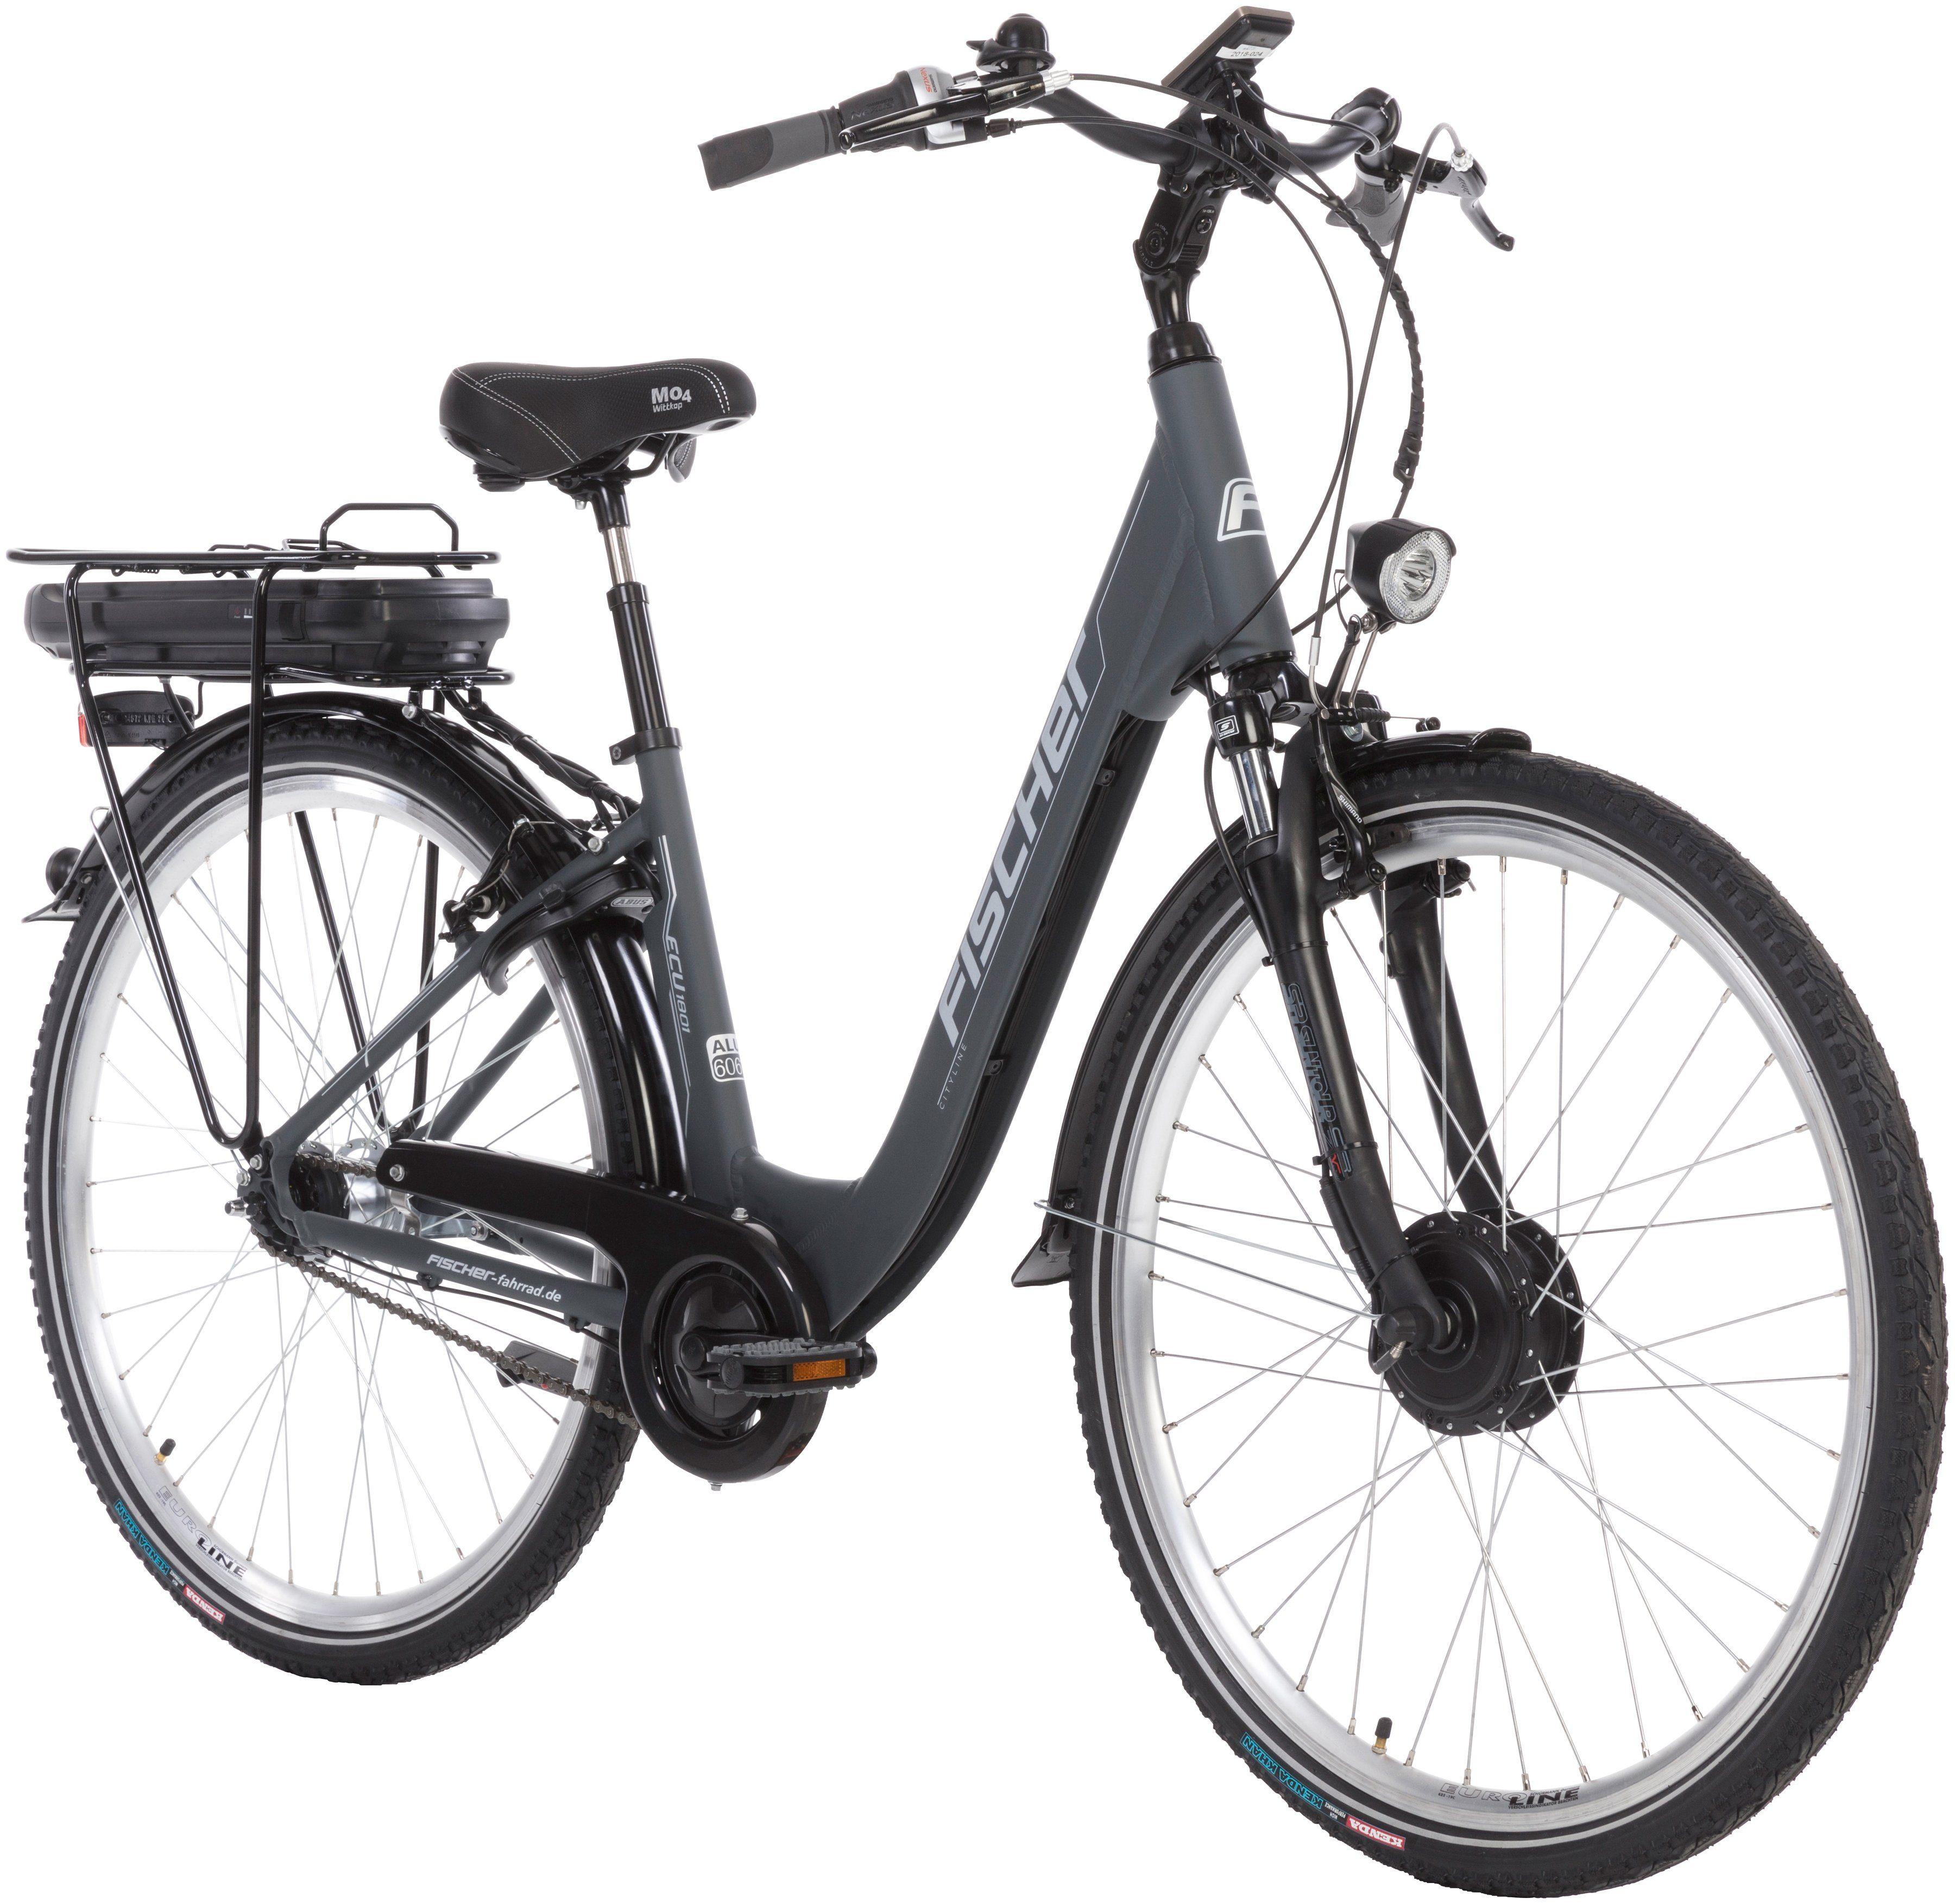 FISCHER FAHRRAEDER E-Bike City Damen »ECU1801«, 28 Zoll, 7 Gänge, 396 Wh